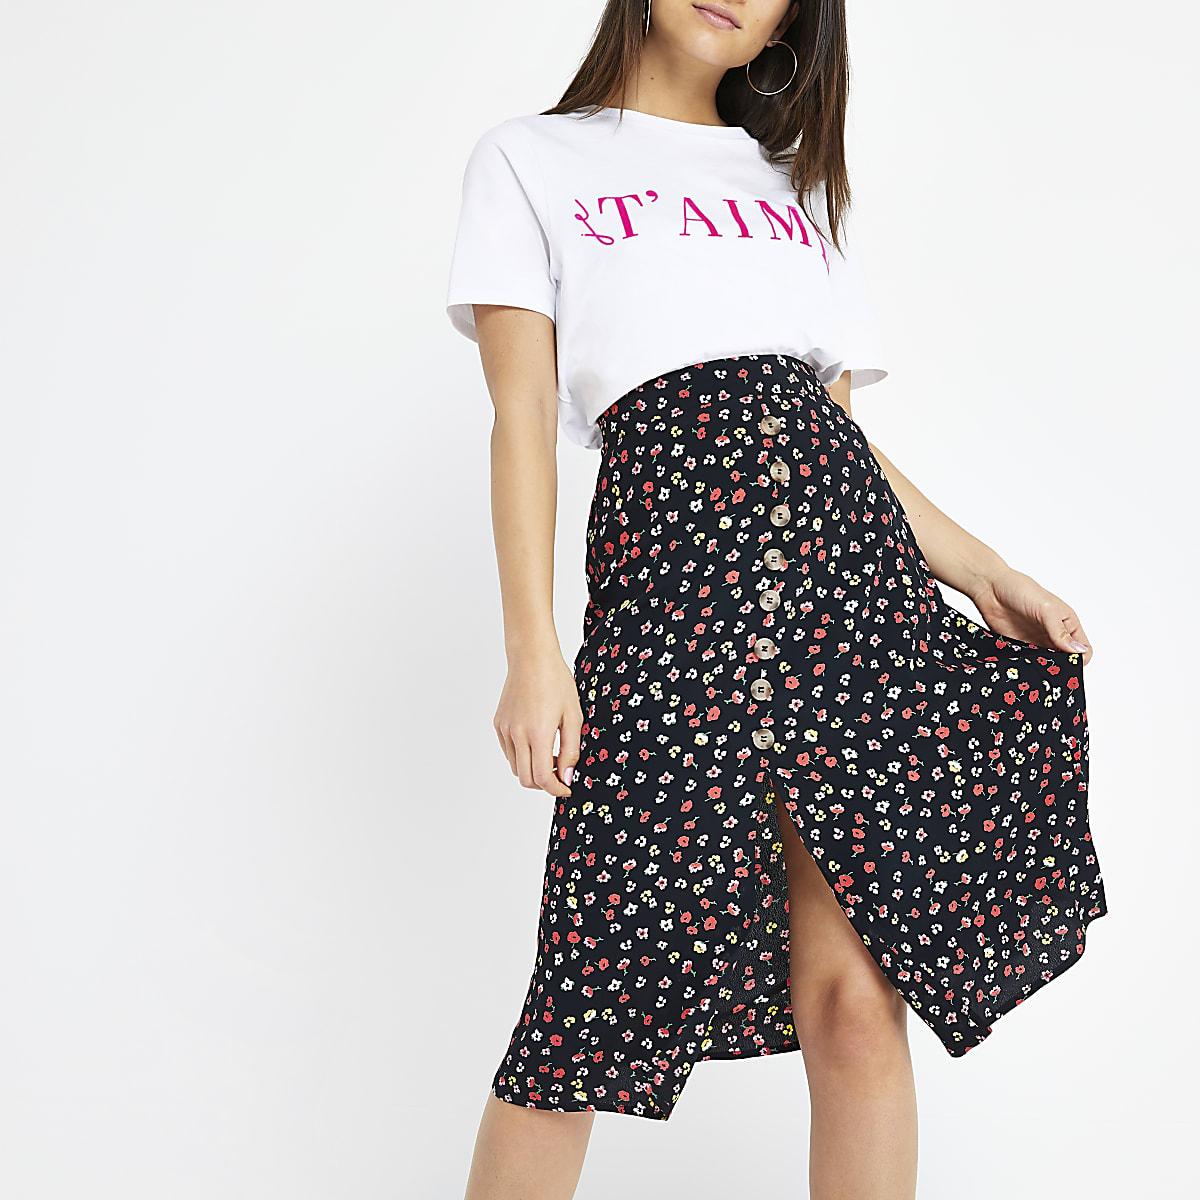 Petite black ditsy floral midi skirt